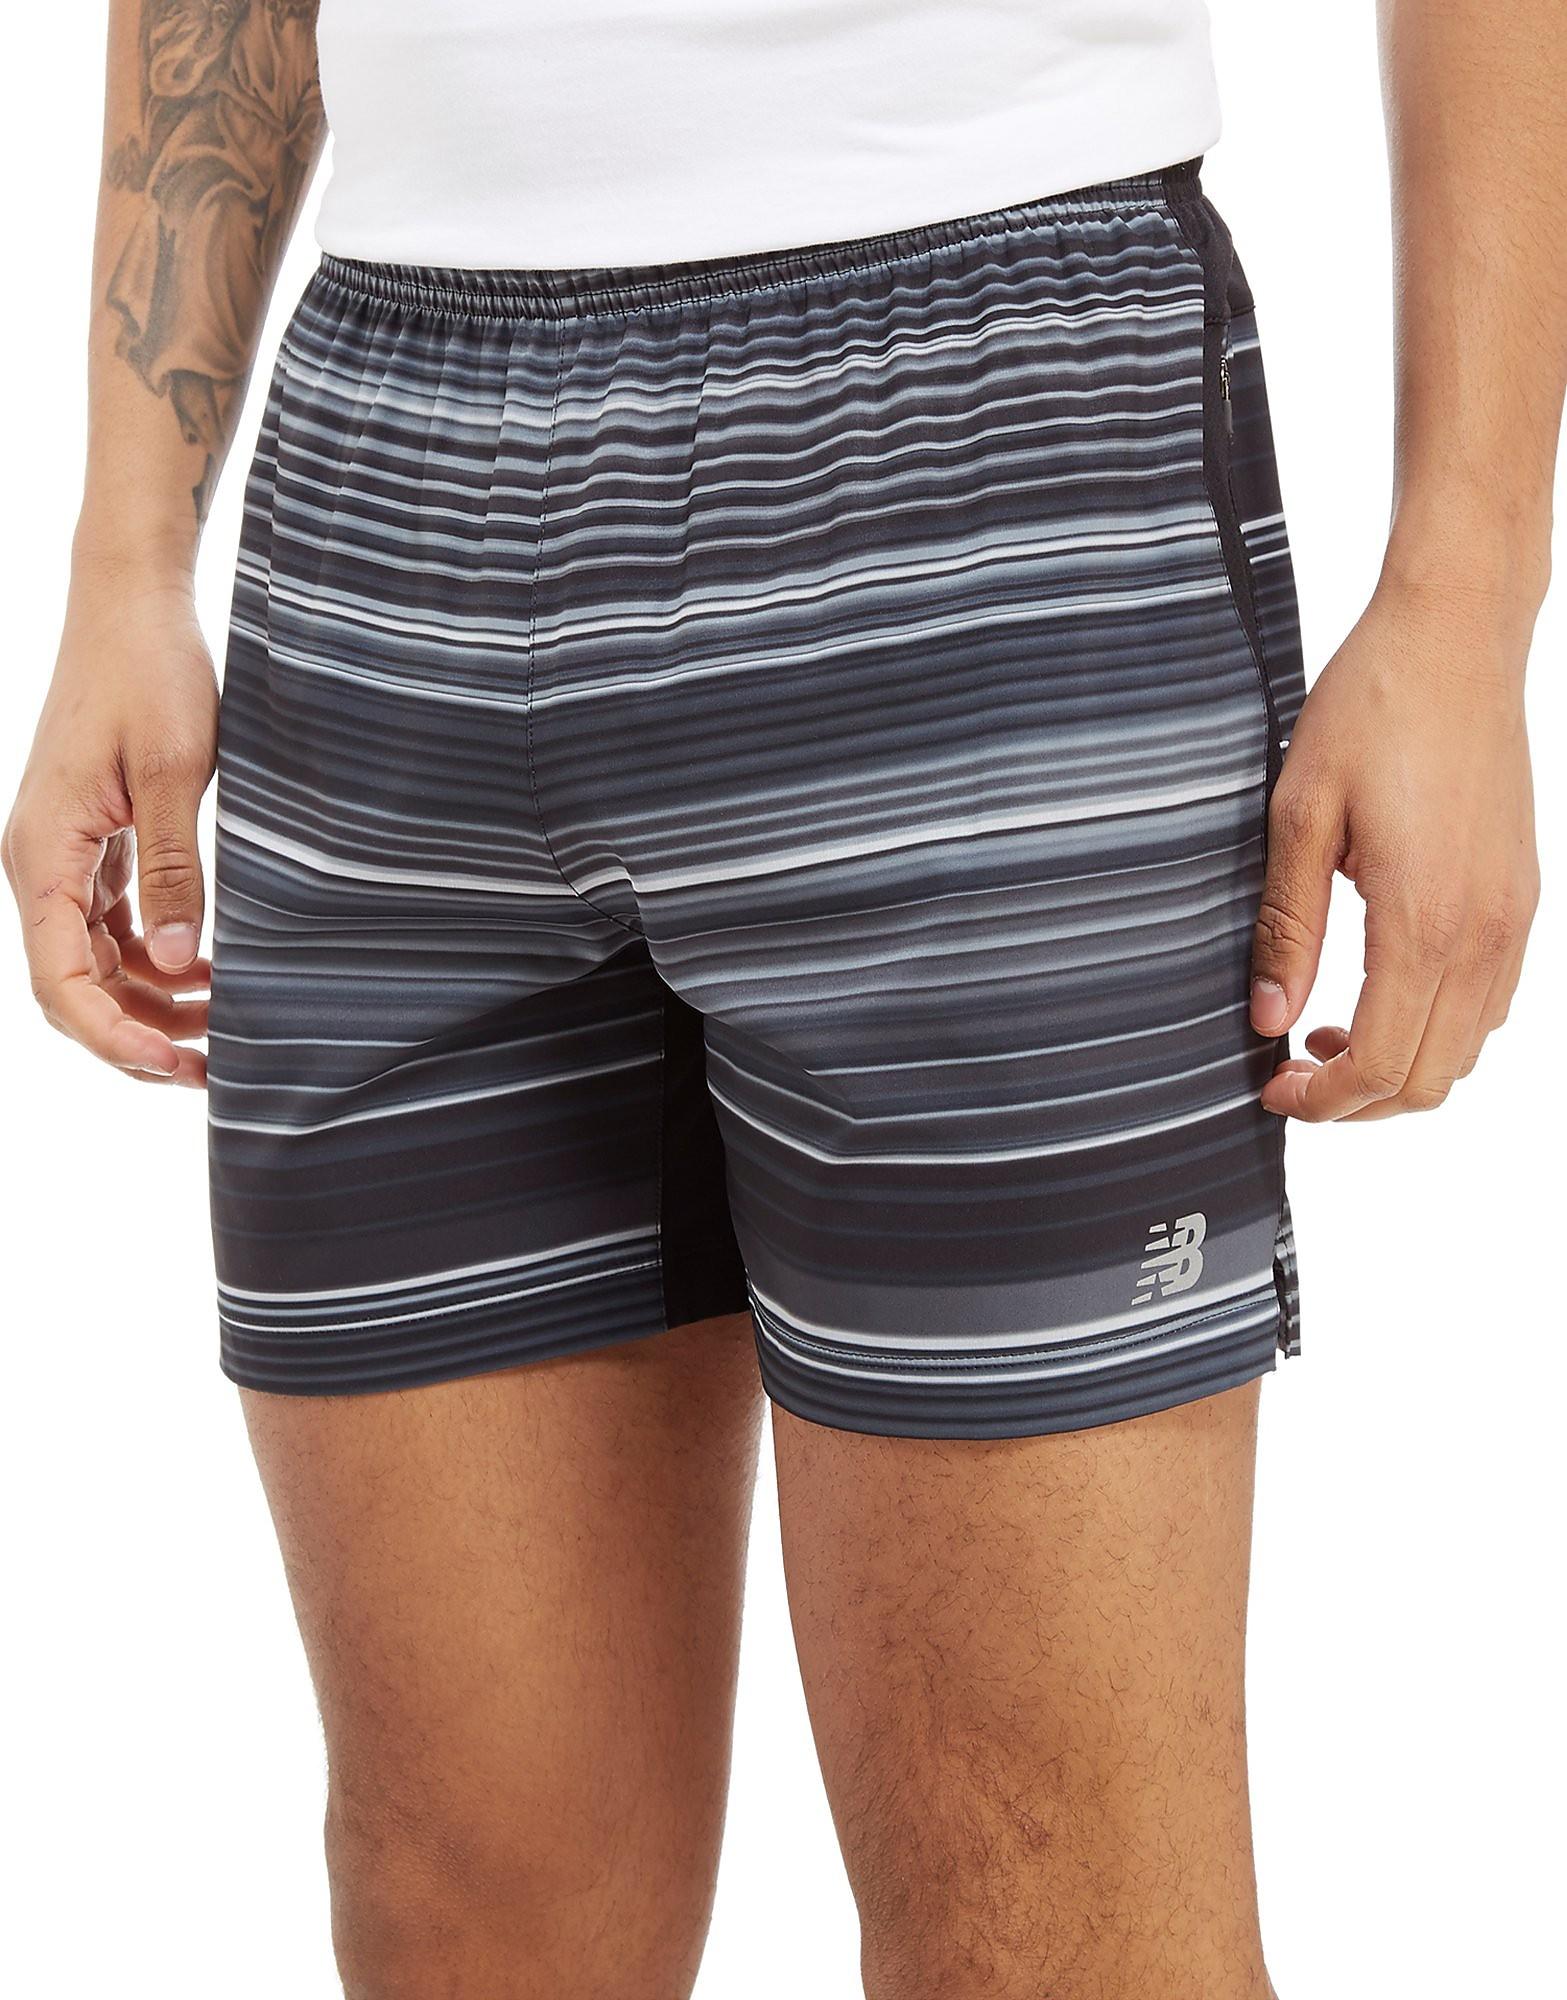 Impact Print Shorts